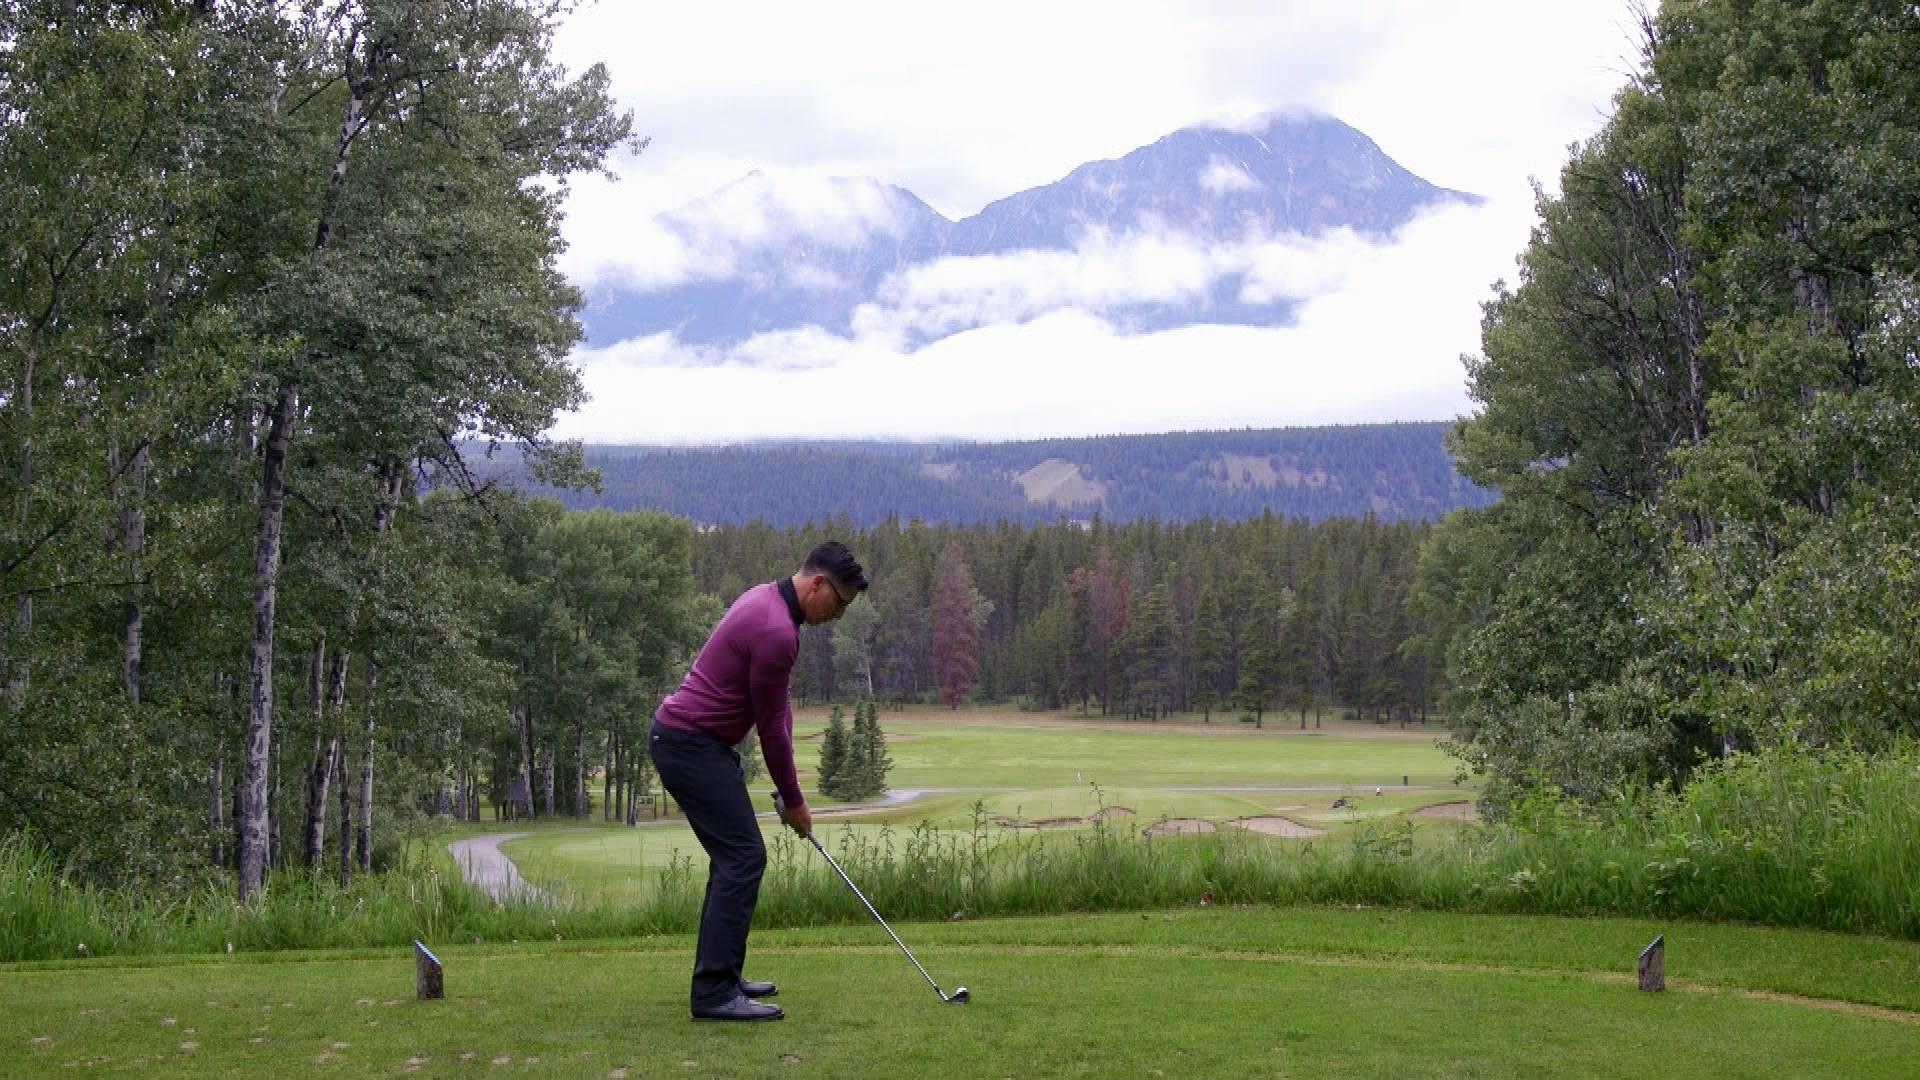 Jasper golfing